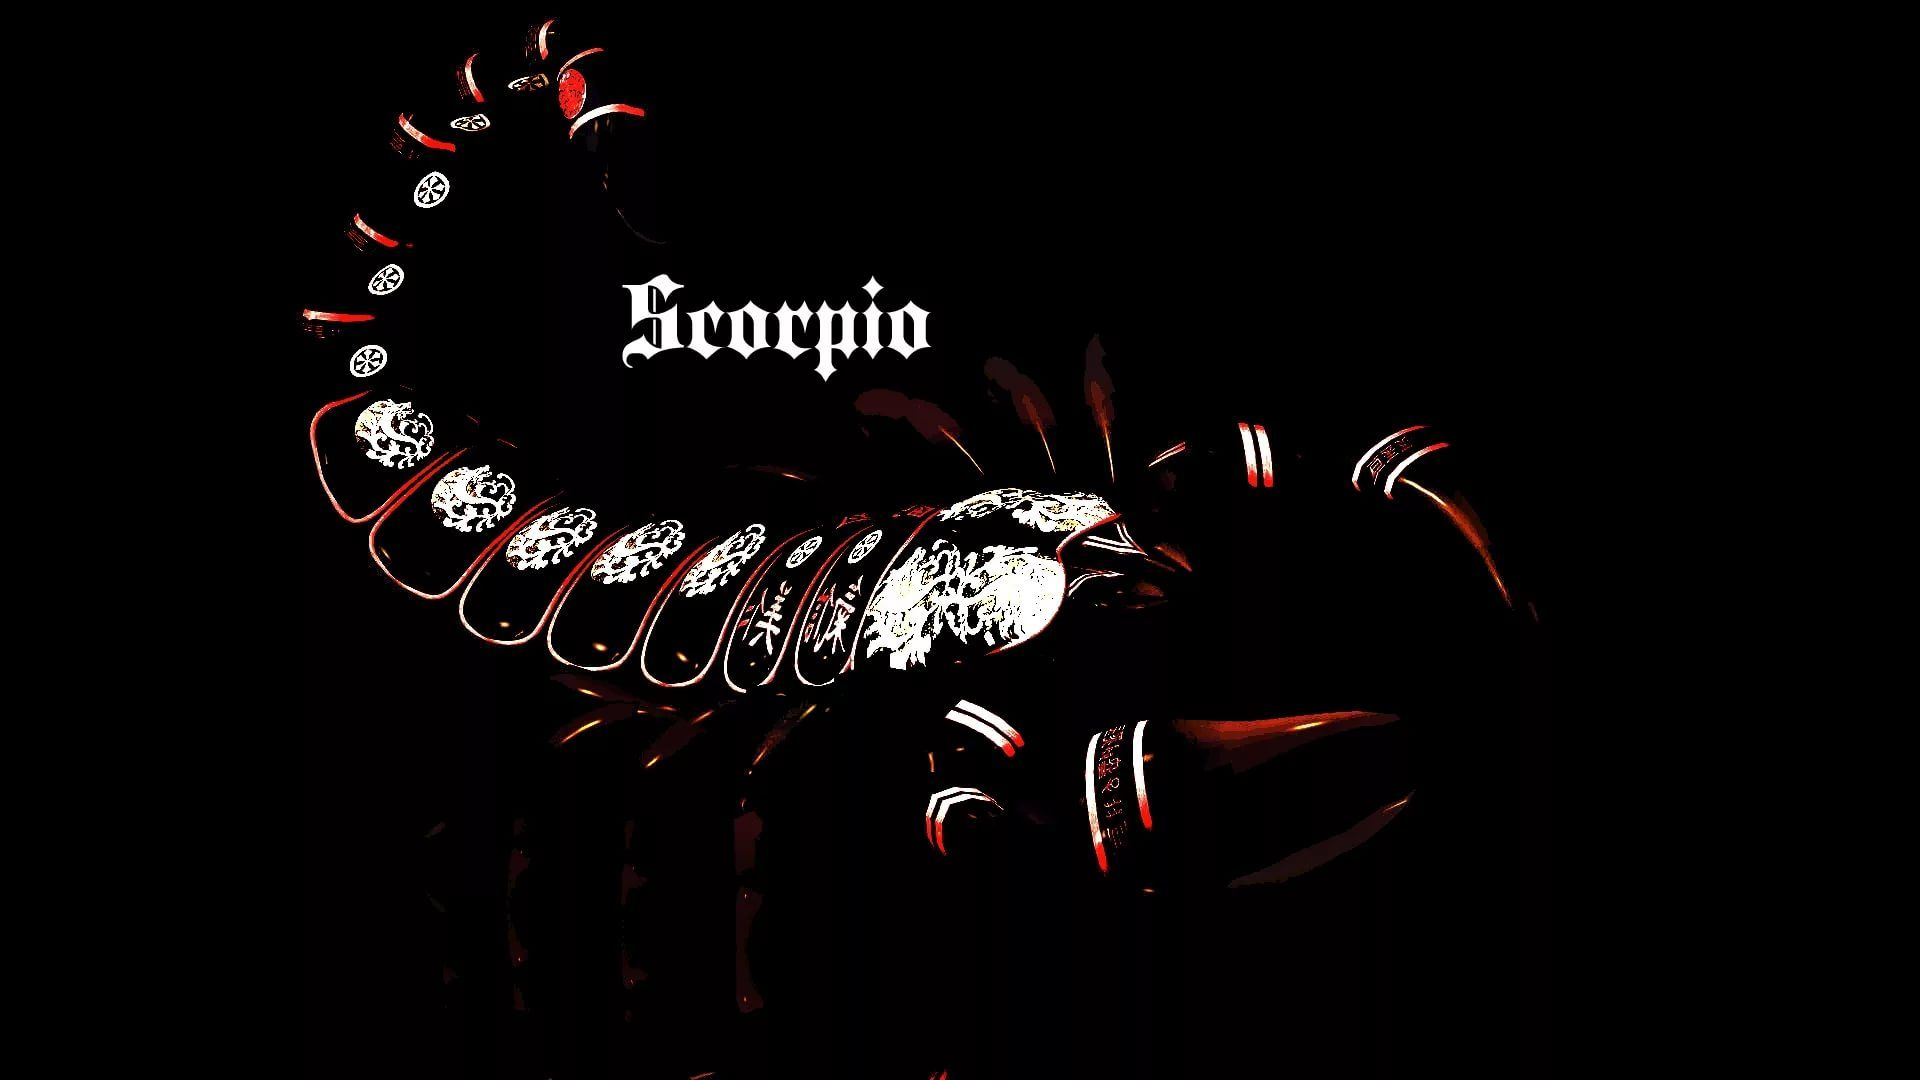 Scorpio hd wallpaper 1080